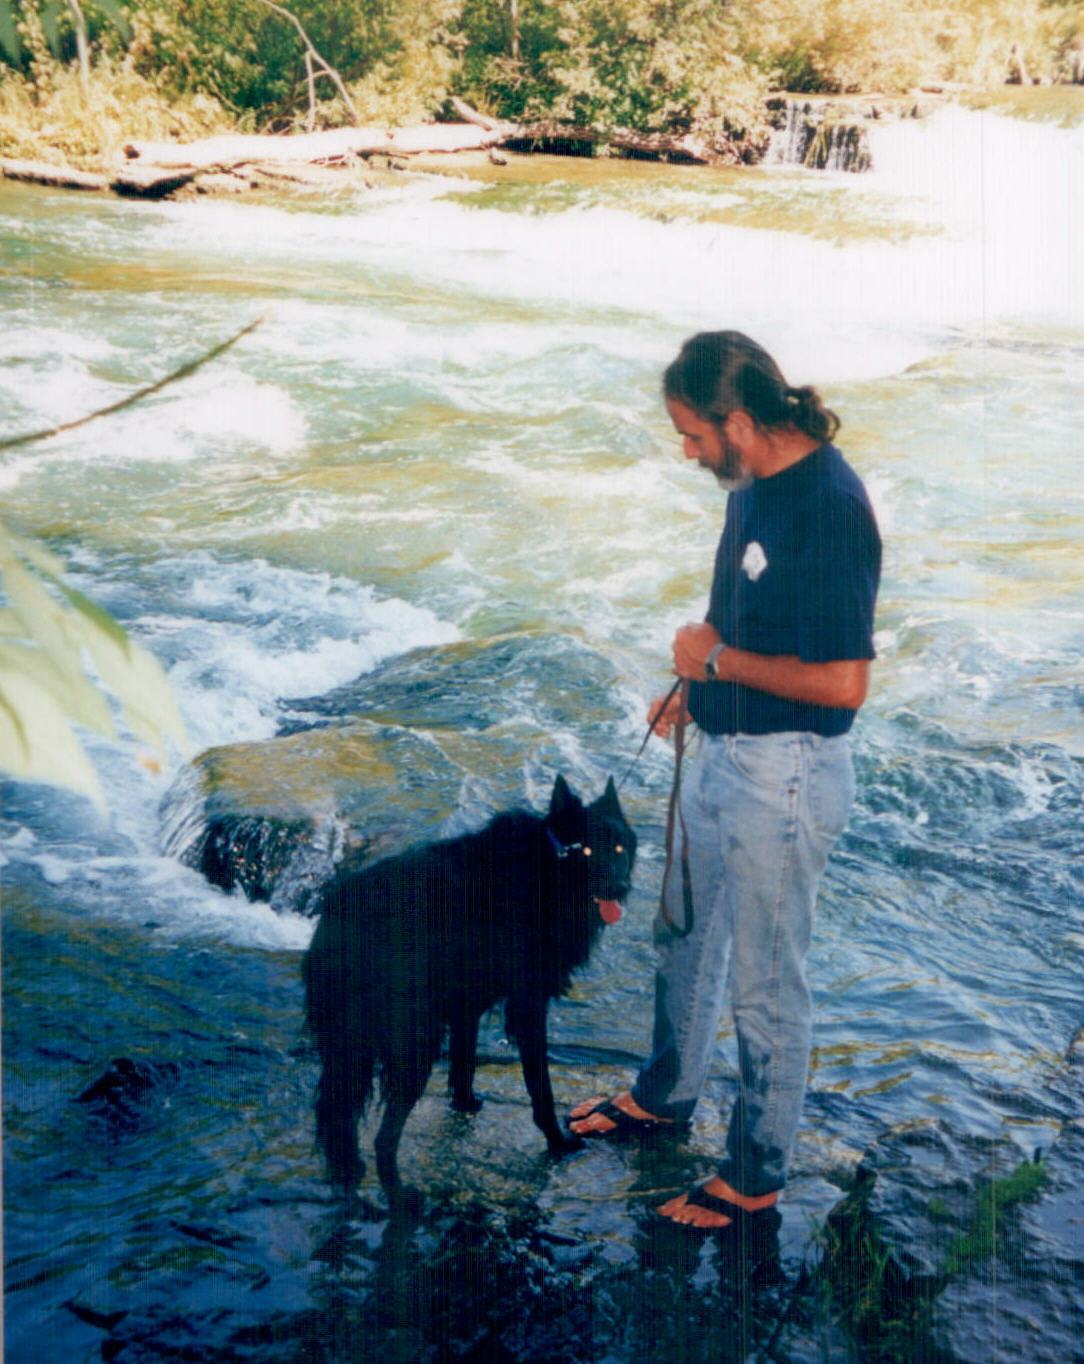 Niagara Falls, 2003